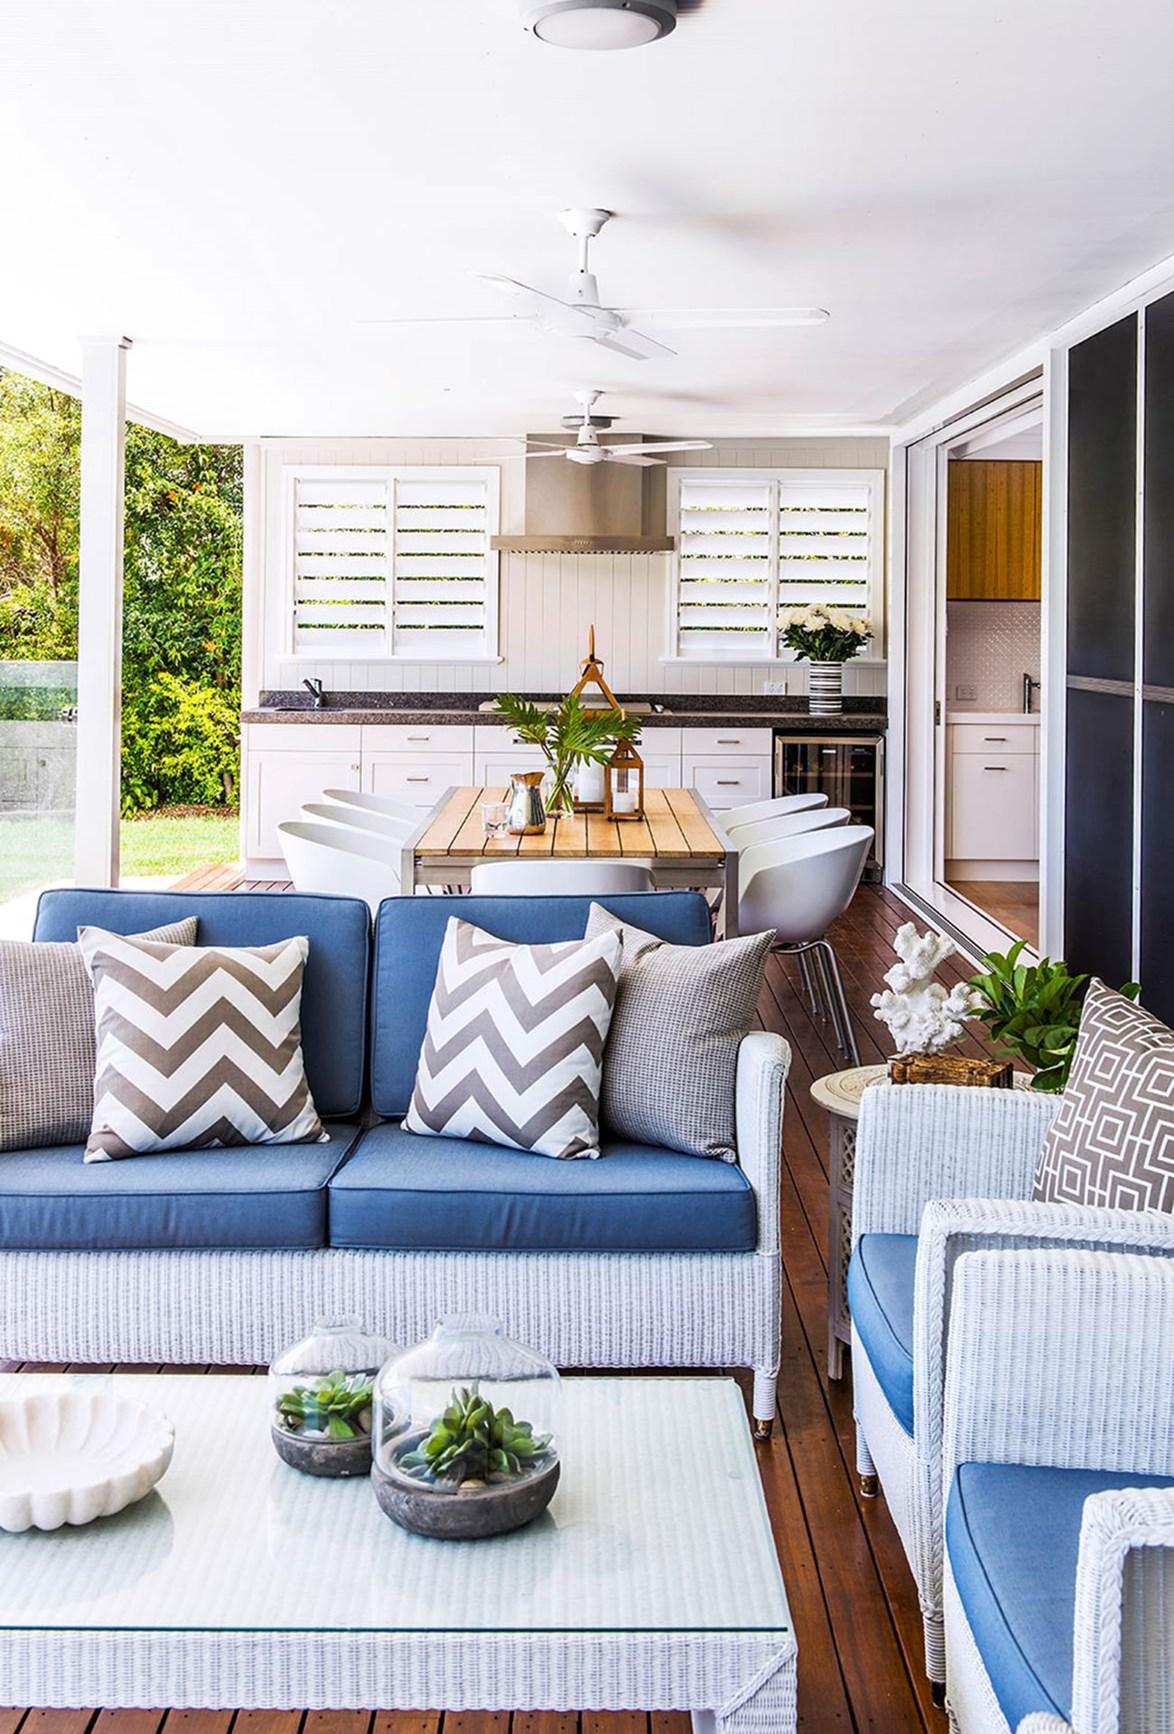 "[12 outdoor kitchen ideas that will inspire you to entertain >](https://www.homestolove.com.au/outdoor-kitchen-ideas-6227|target=""_blank"")"